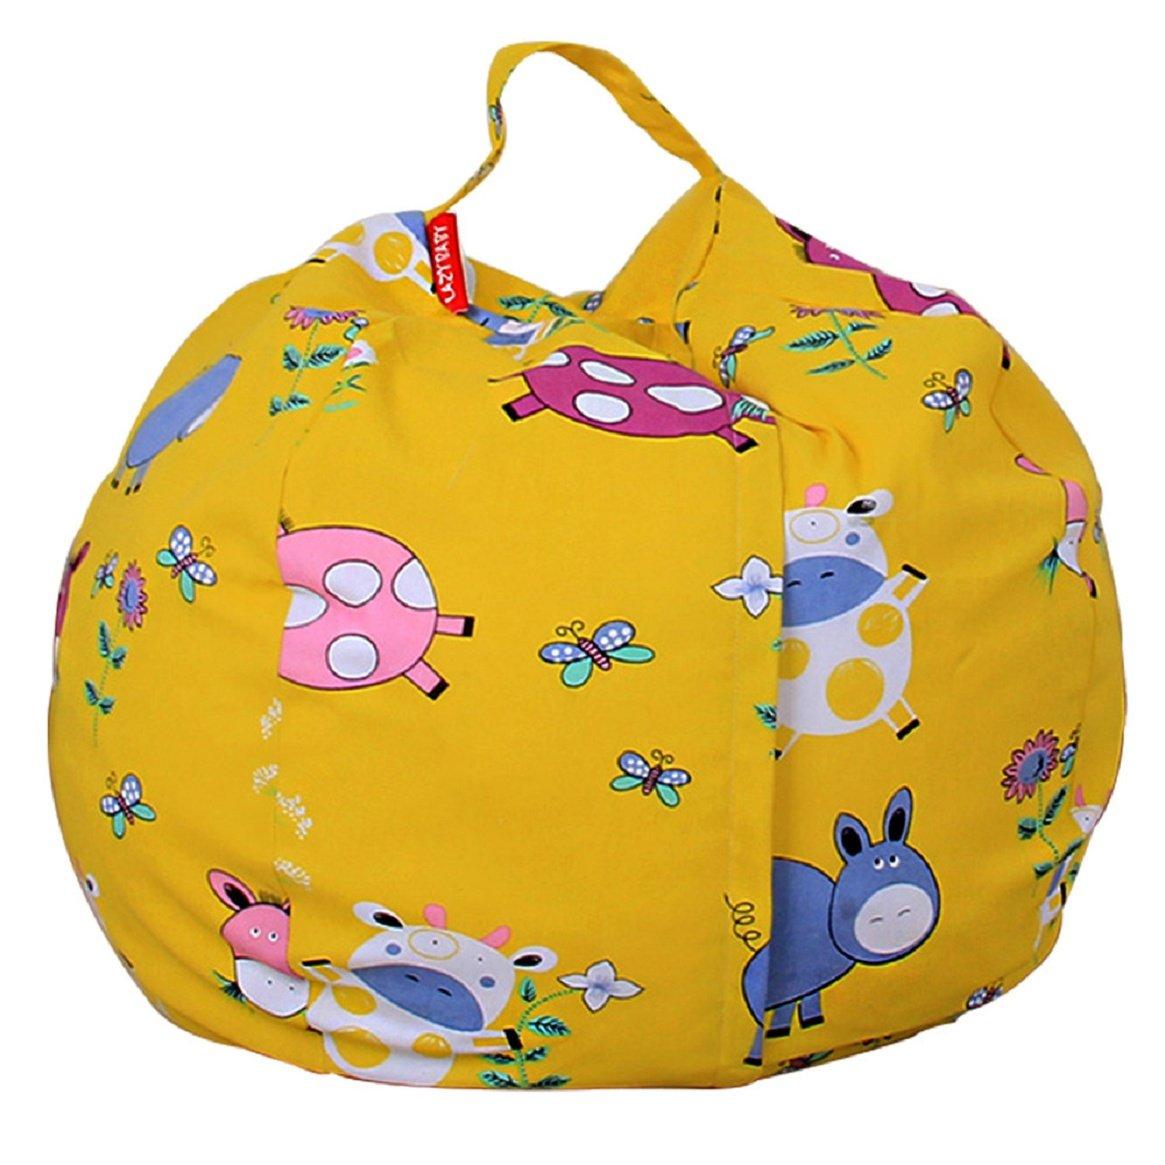 Coerni Stuffed Animal Storage Bean Bag Chair - Cotton Perimeter 55'' (A)